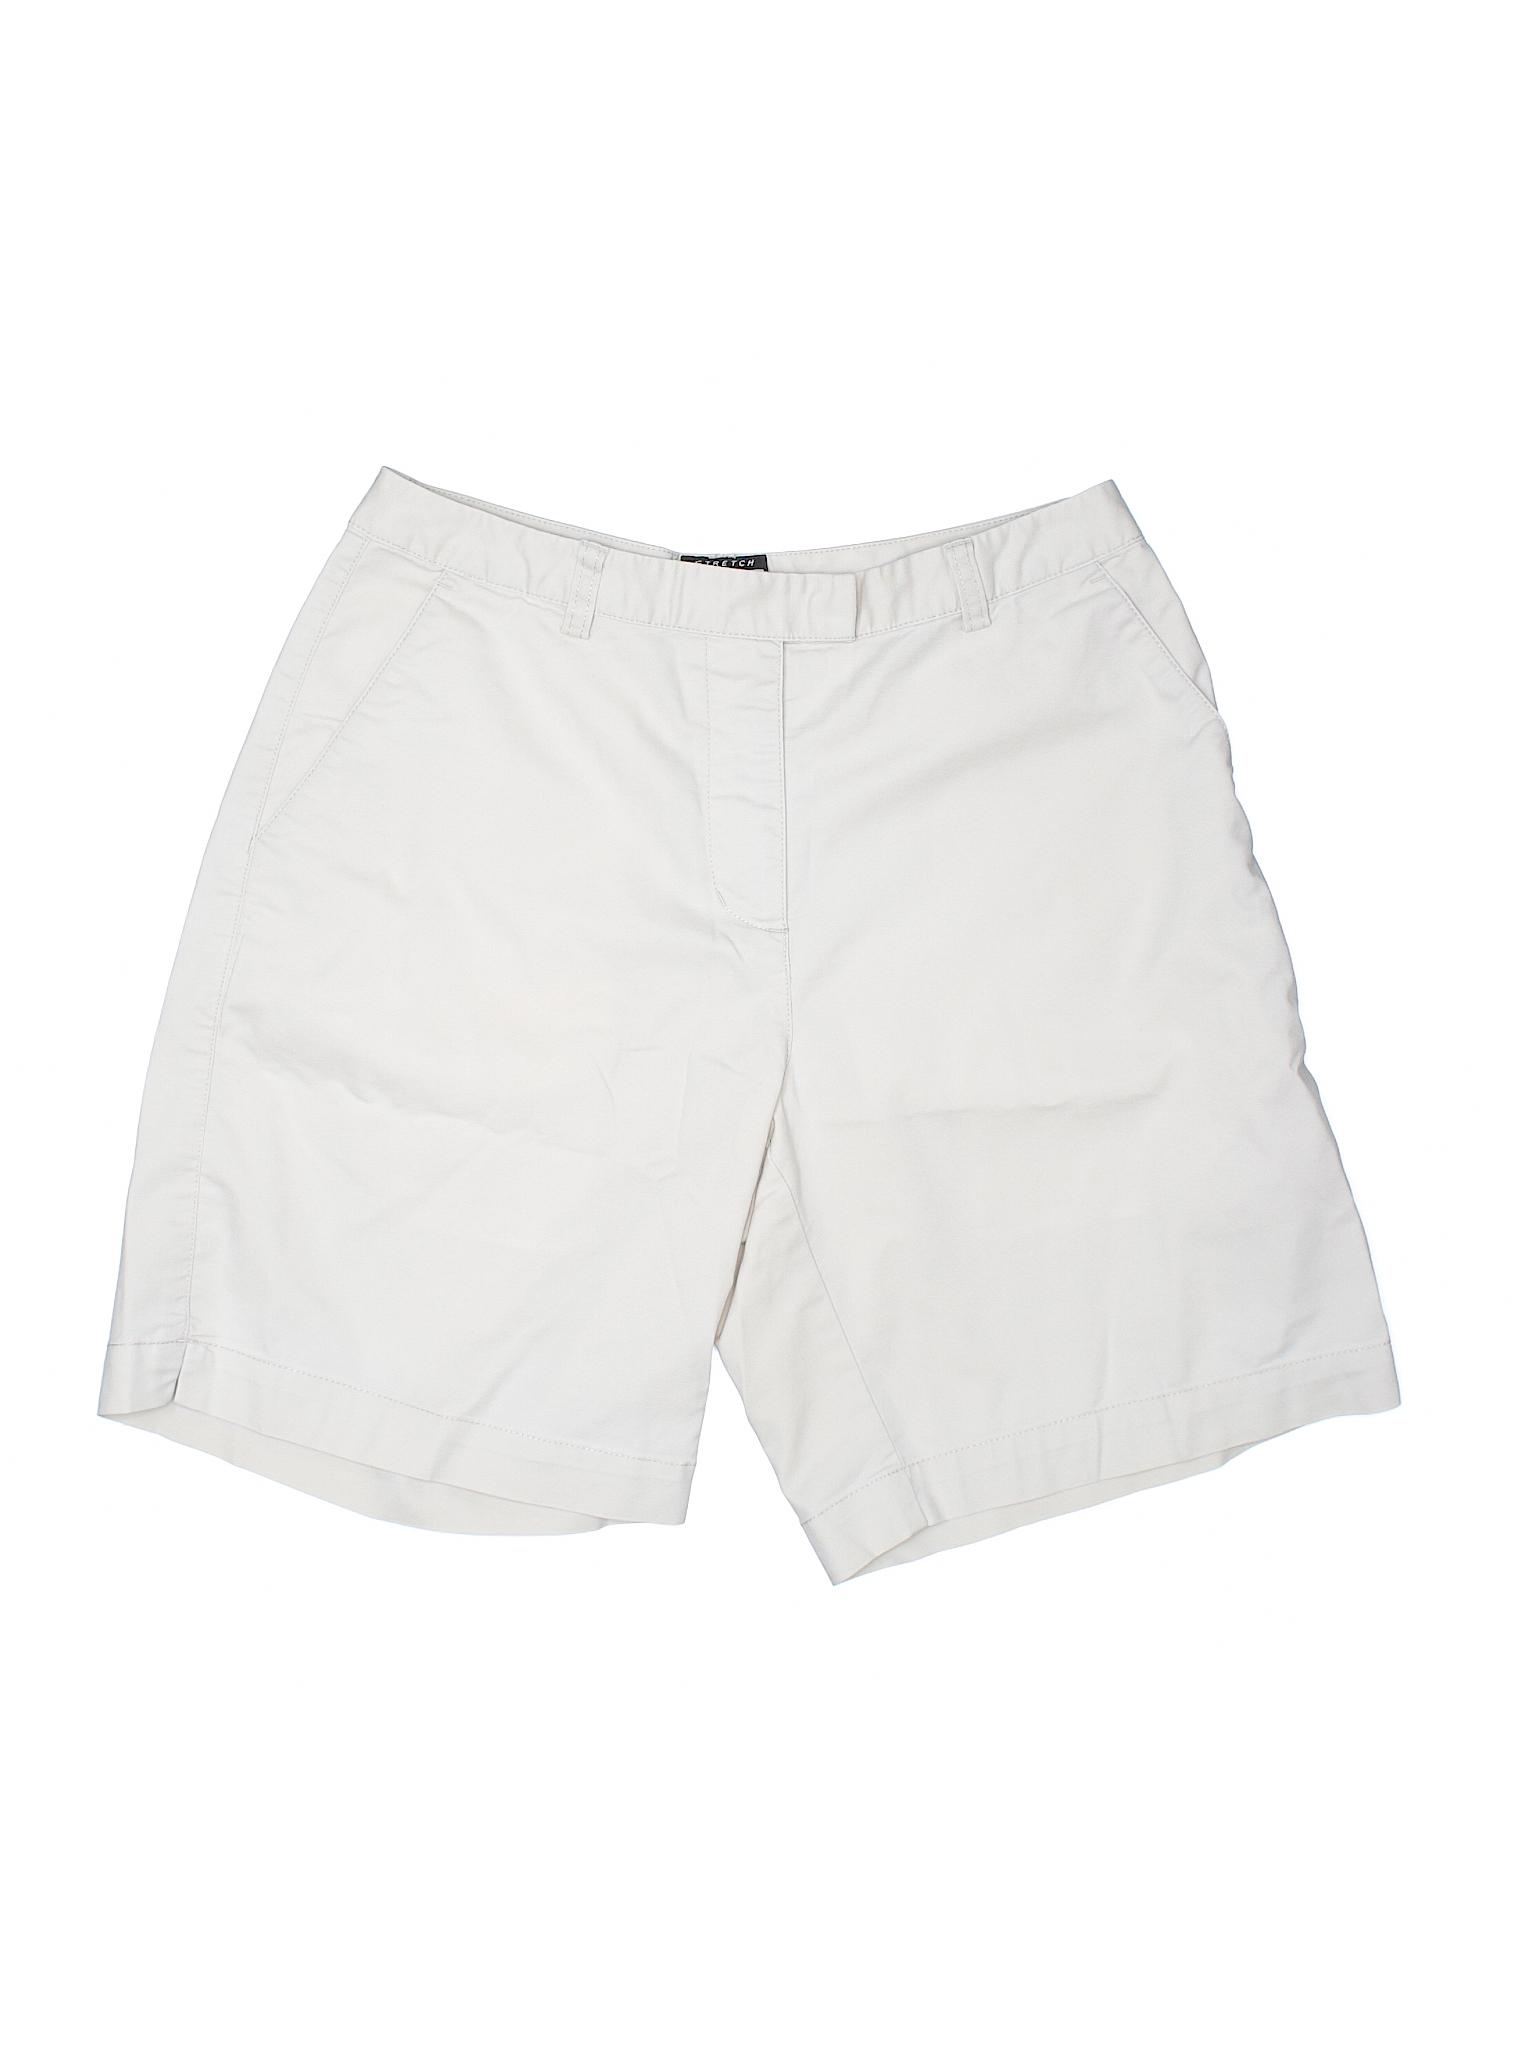 Khaki Boutique Shorts Boutique Adidas Khaki Adidas U7vq4wZn